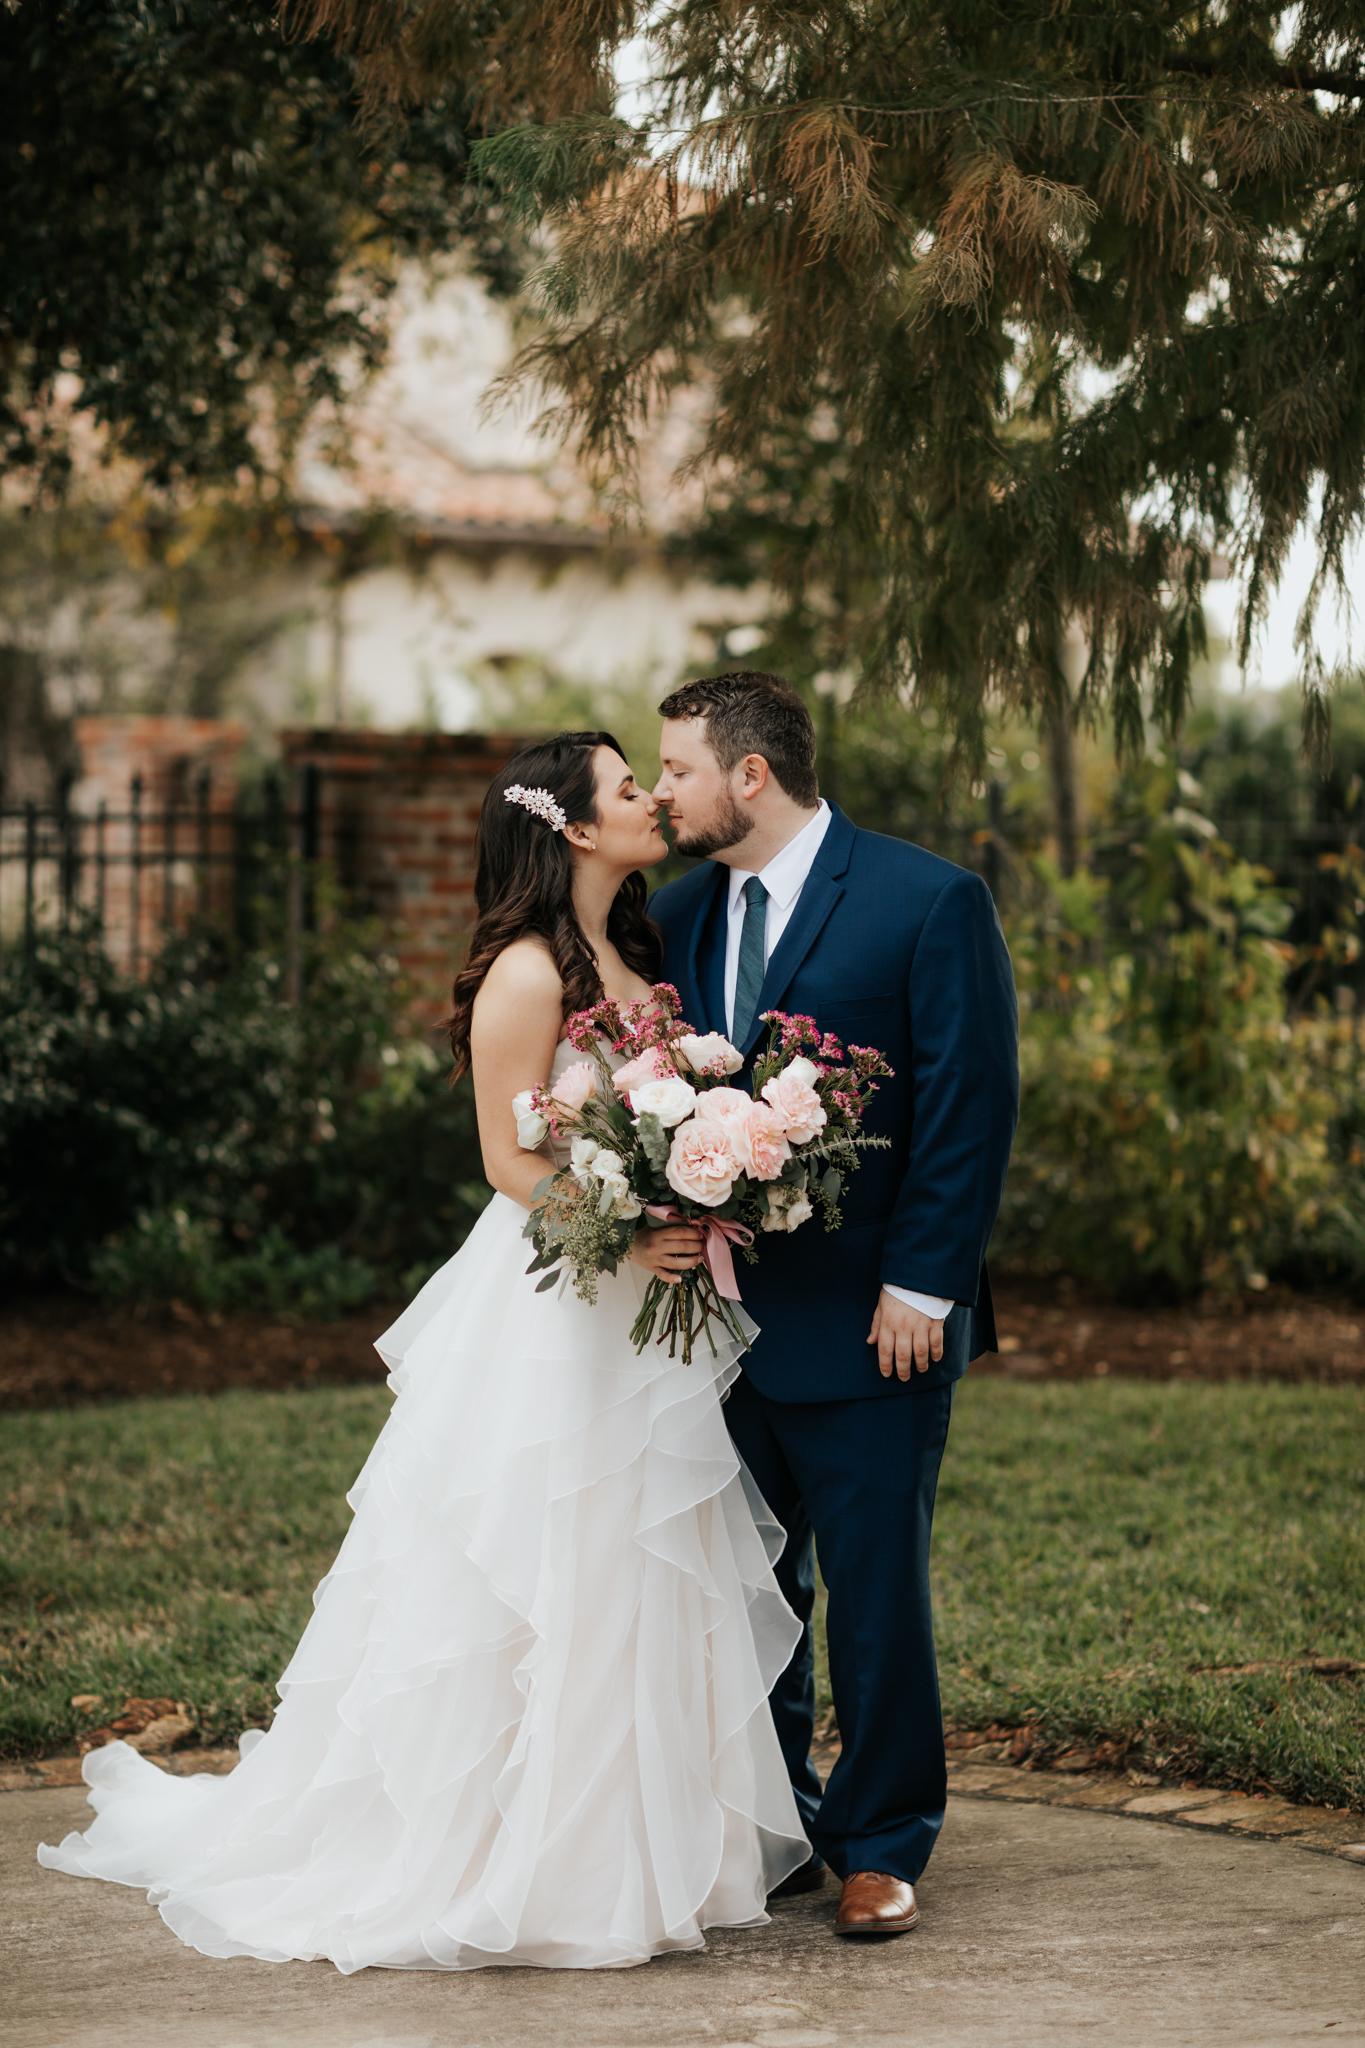 Leah Nicole Photography - Houston Wedding Photographer-Lake Conroe Wedding- Houston Wedding Photographer-13.jpg